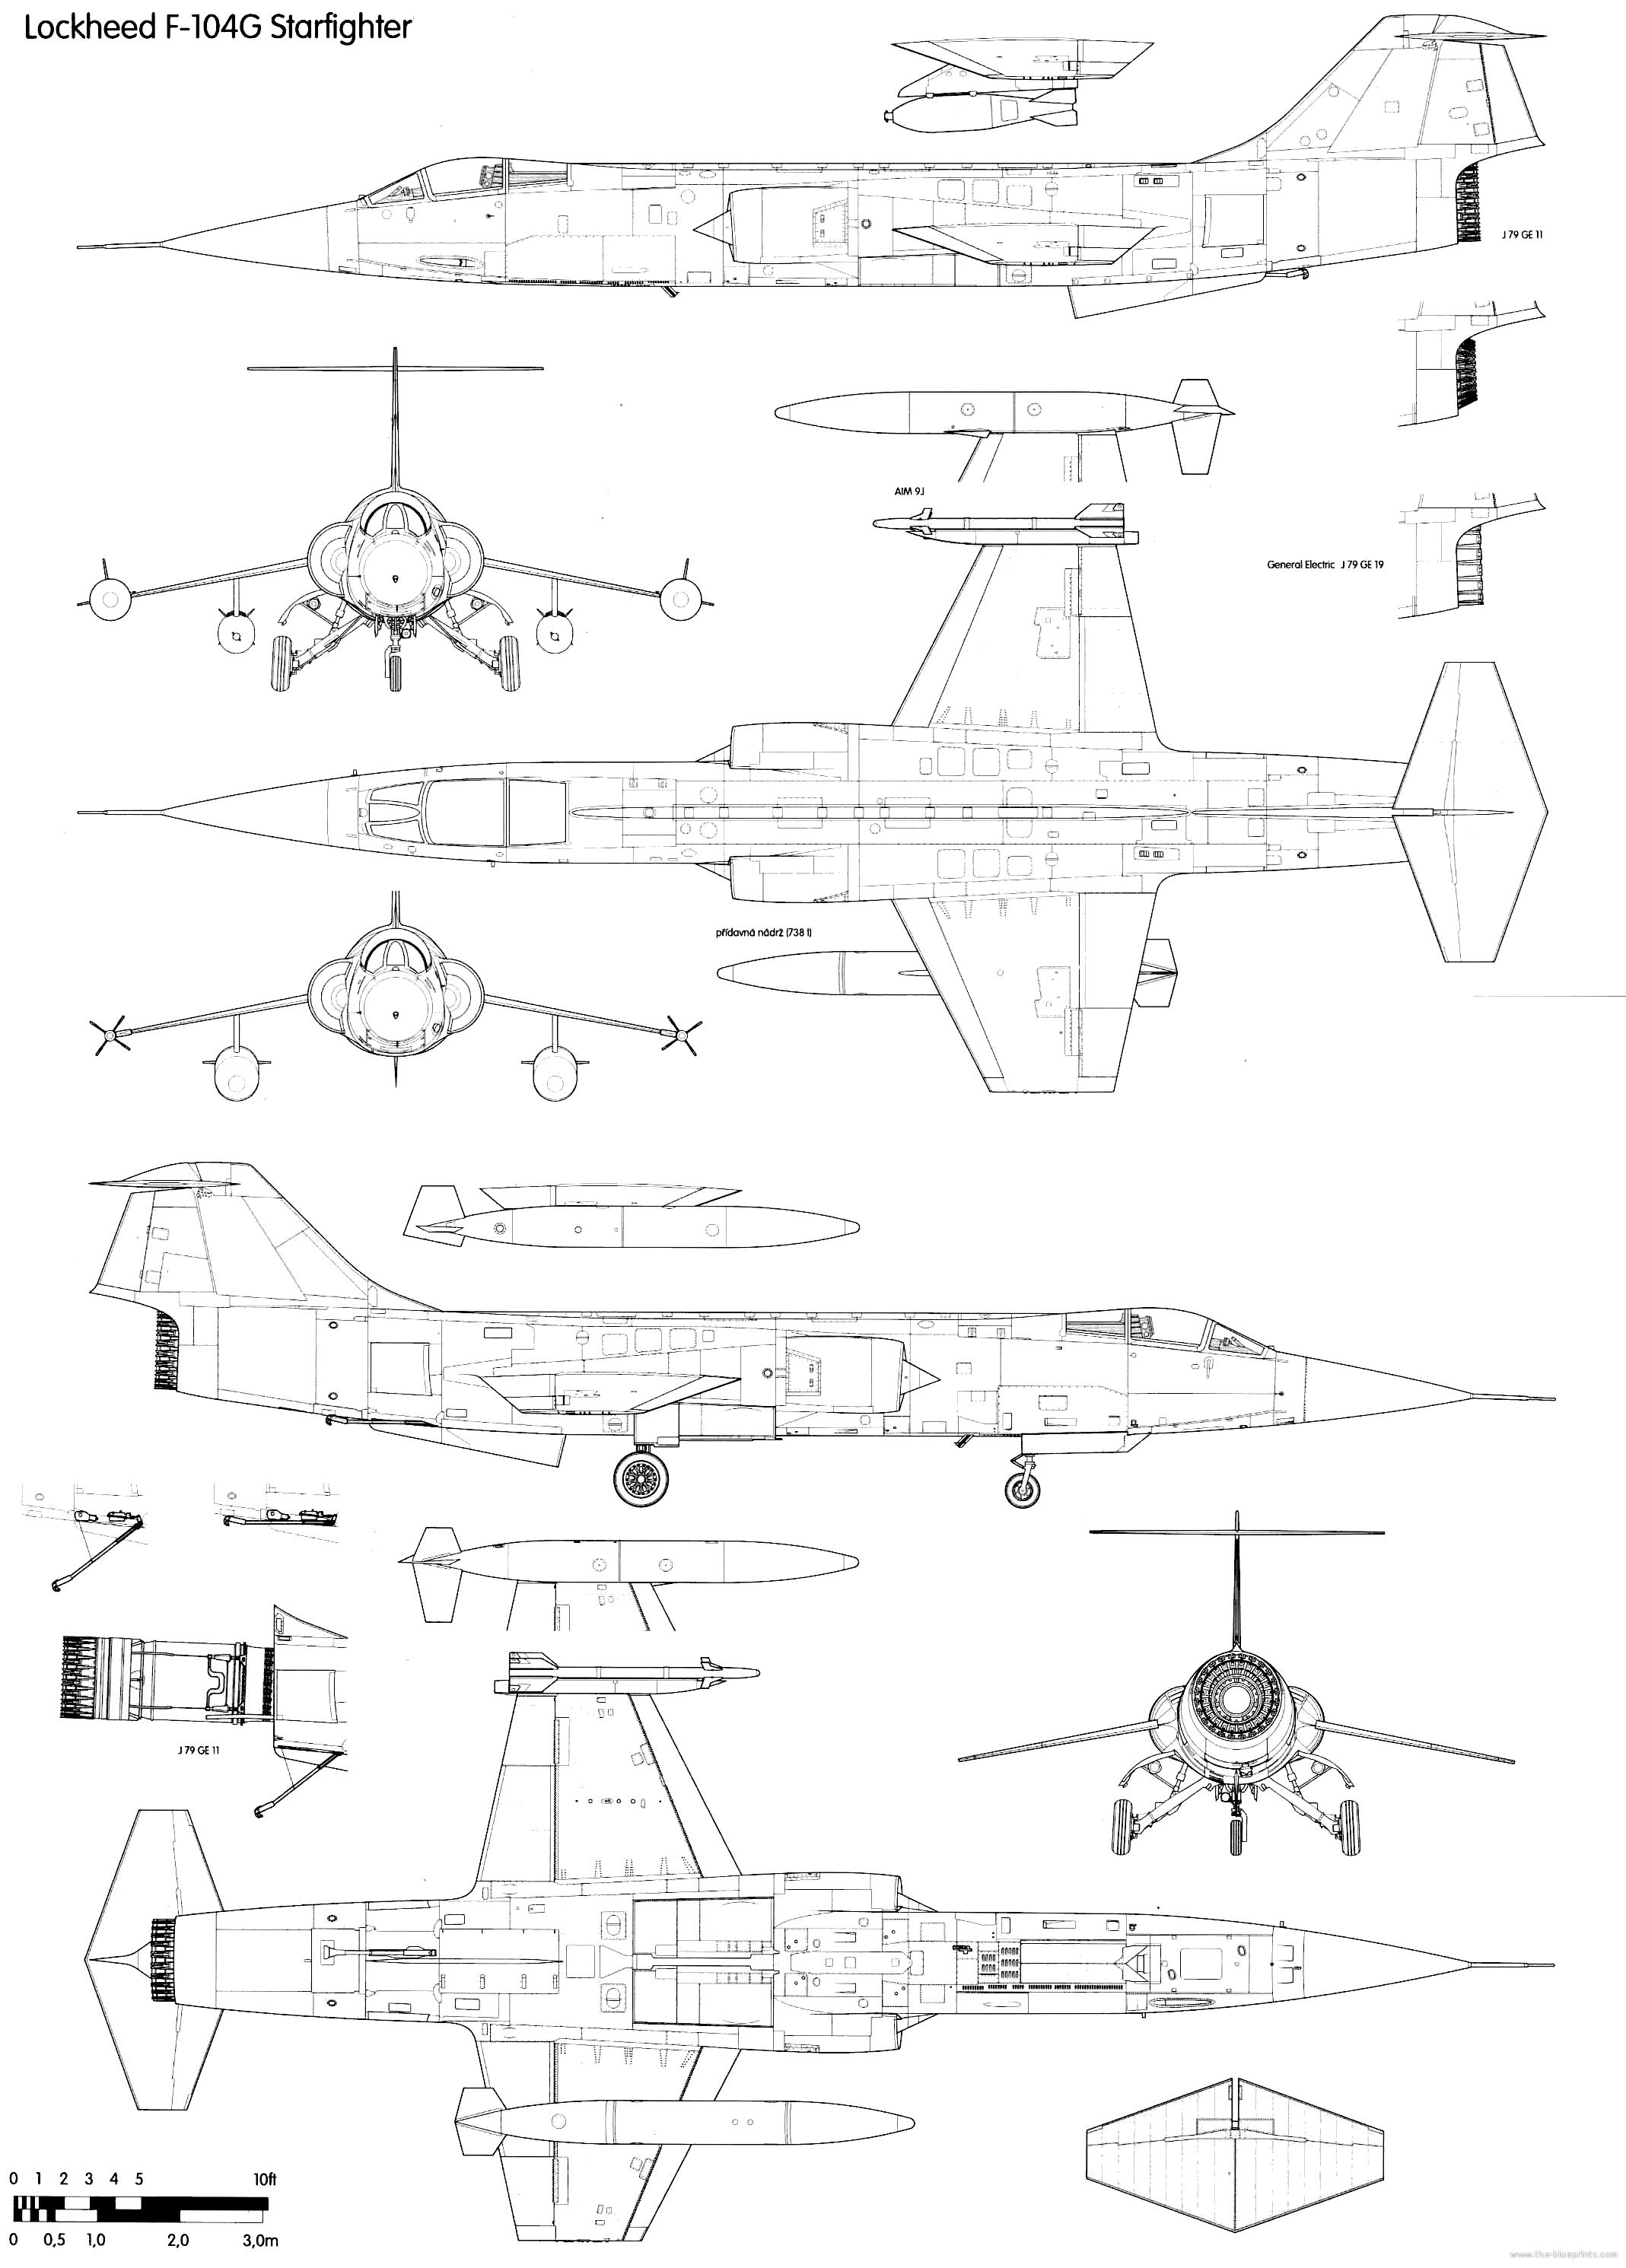 Beste blaupausen tutorial lesen ideen schaltplan serie circuit blueprints modern airplanes lockheed lockheed f 104g starfighter malvernweather Choice Image